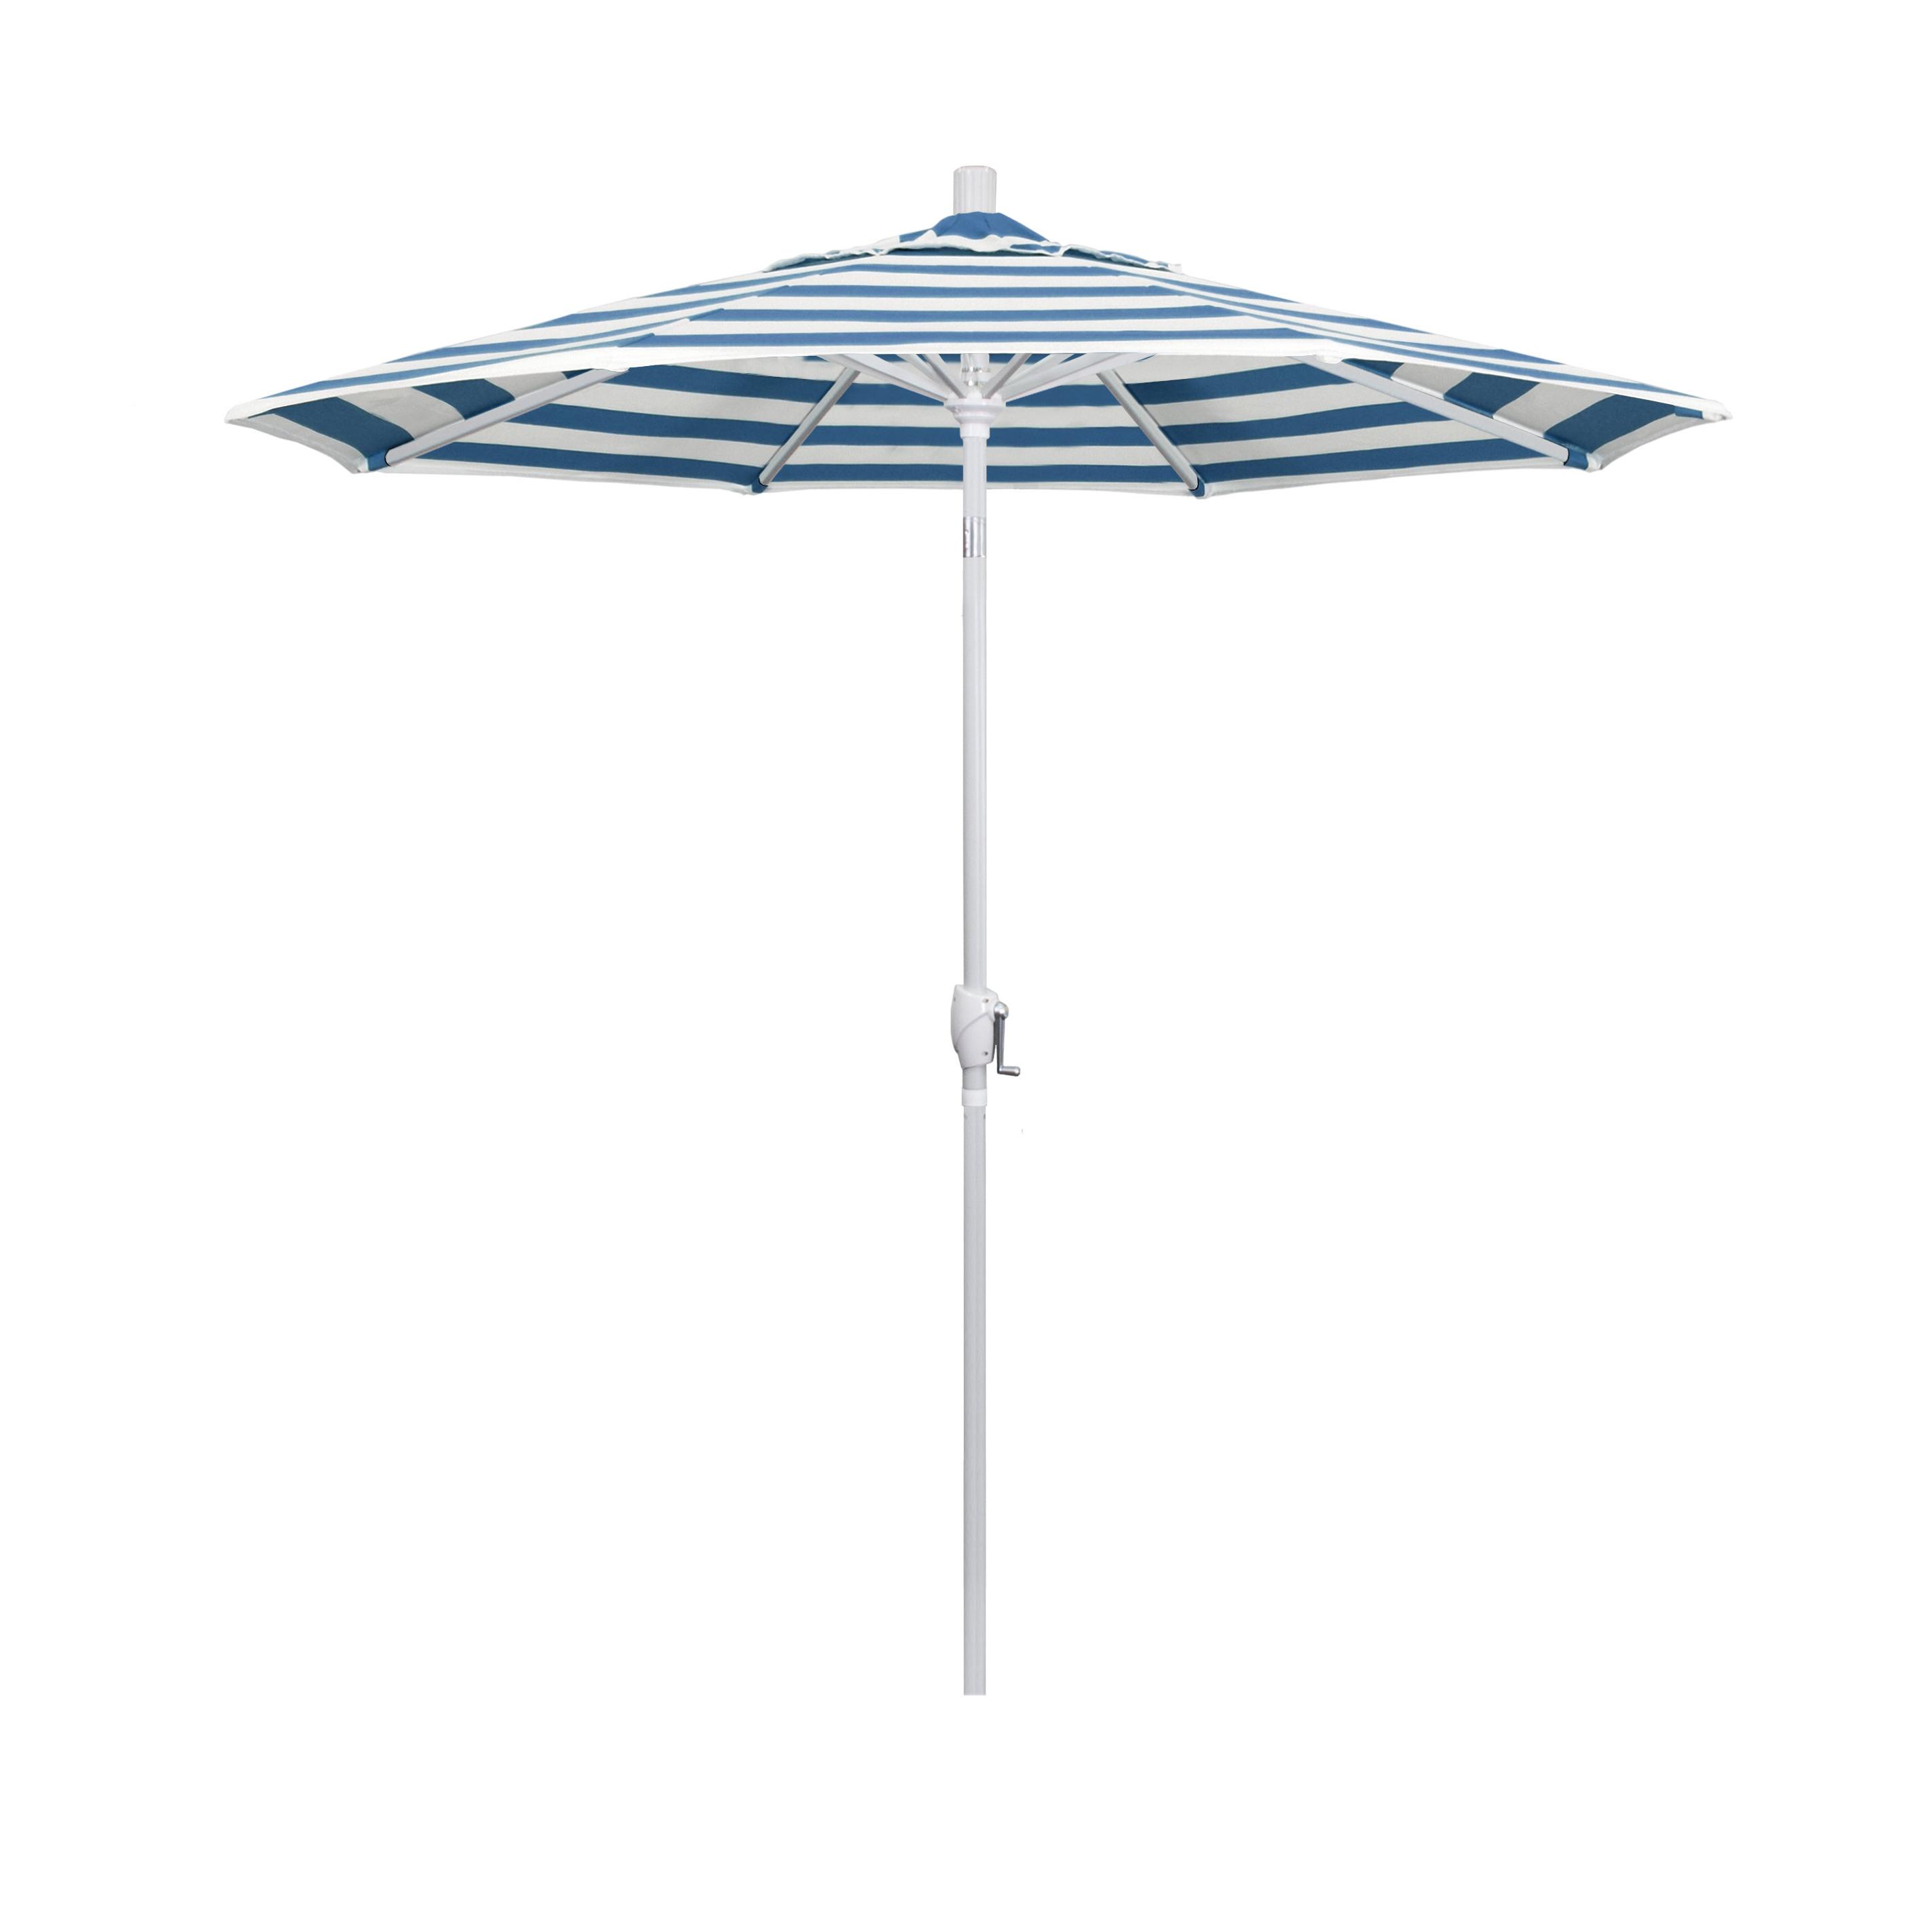 Most Recent Caravelle Market Sunbrella Umbrellas With Regard To (View 9 of 20)